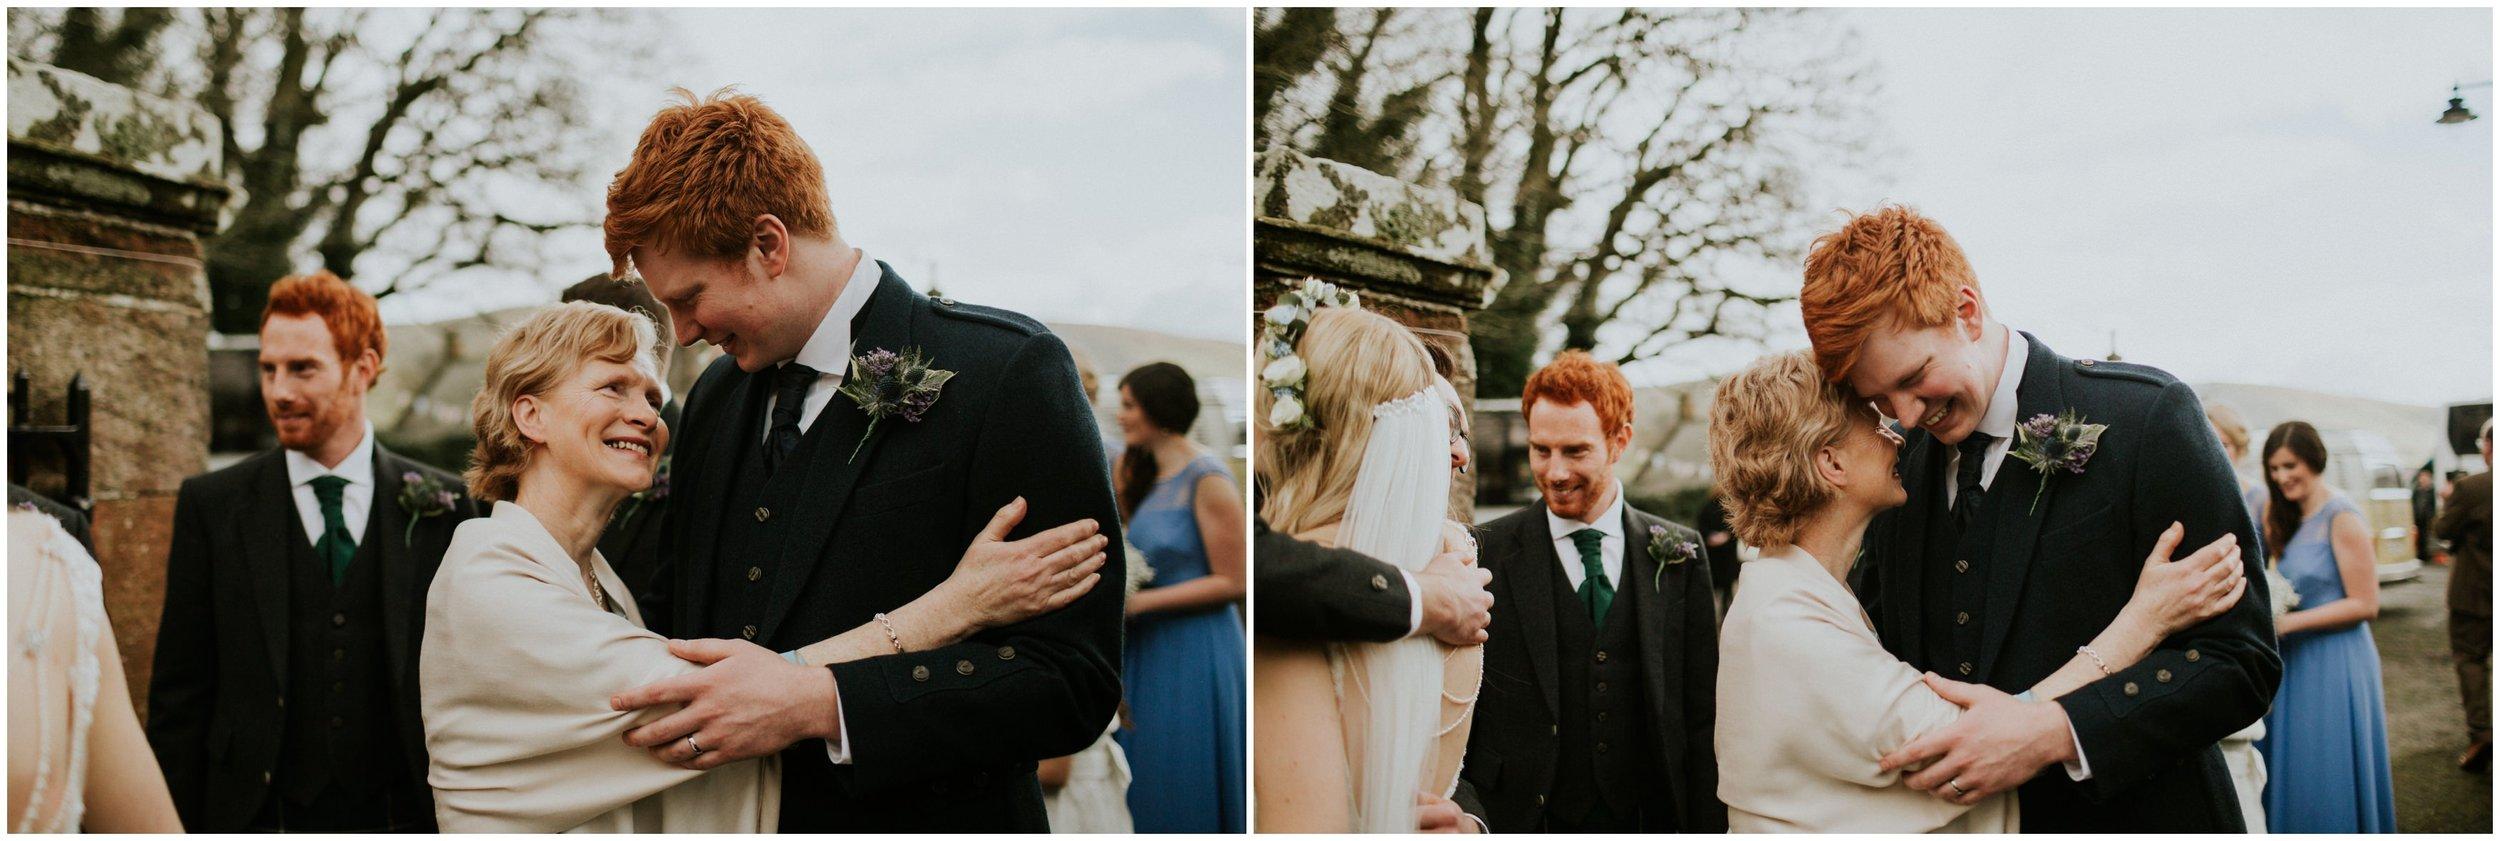 Photography 78 - Glasgow Wedding Photographer - Dave & Alana_0049.jpg